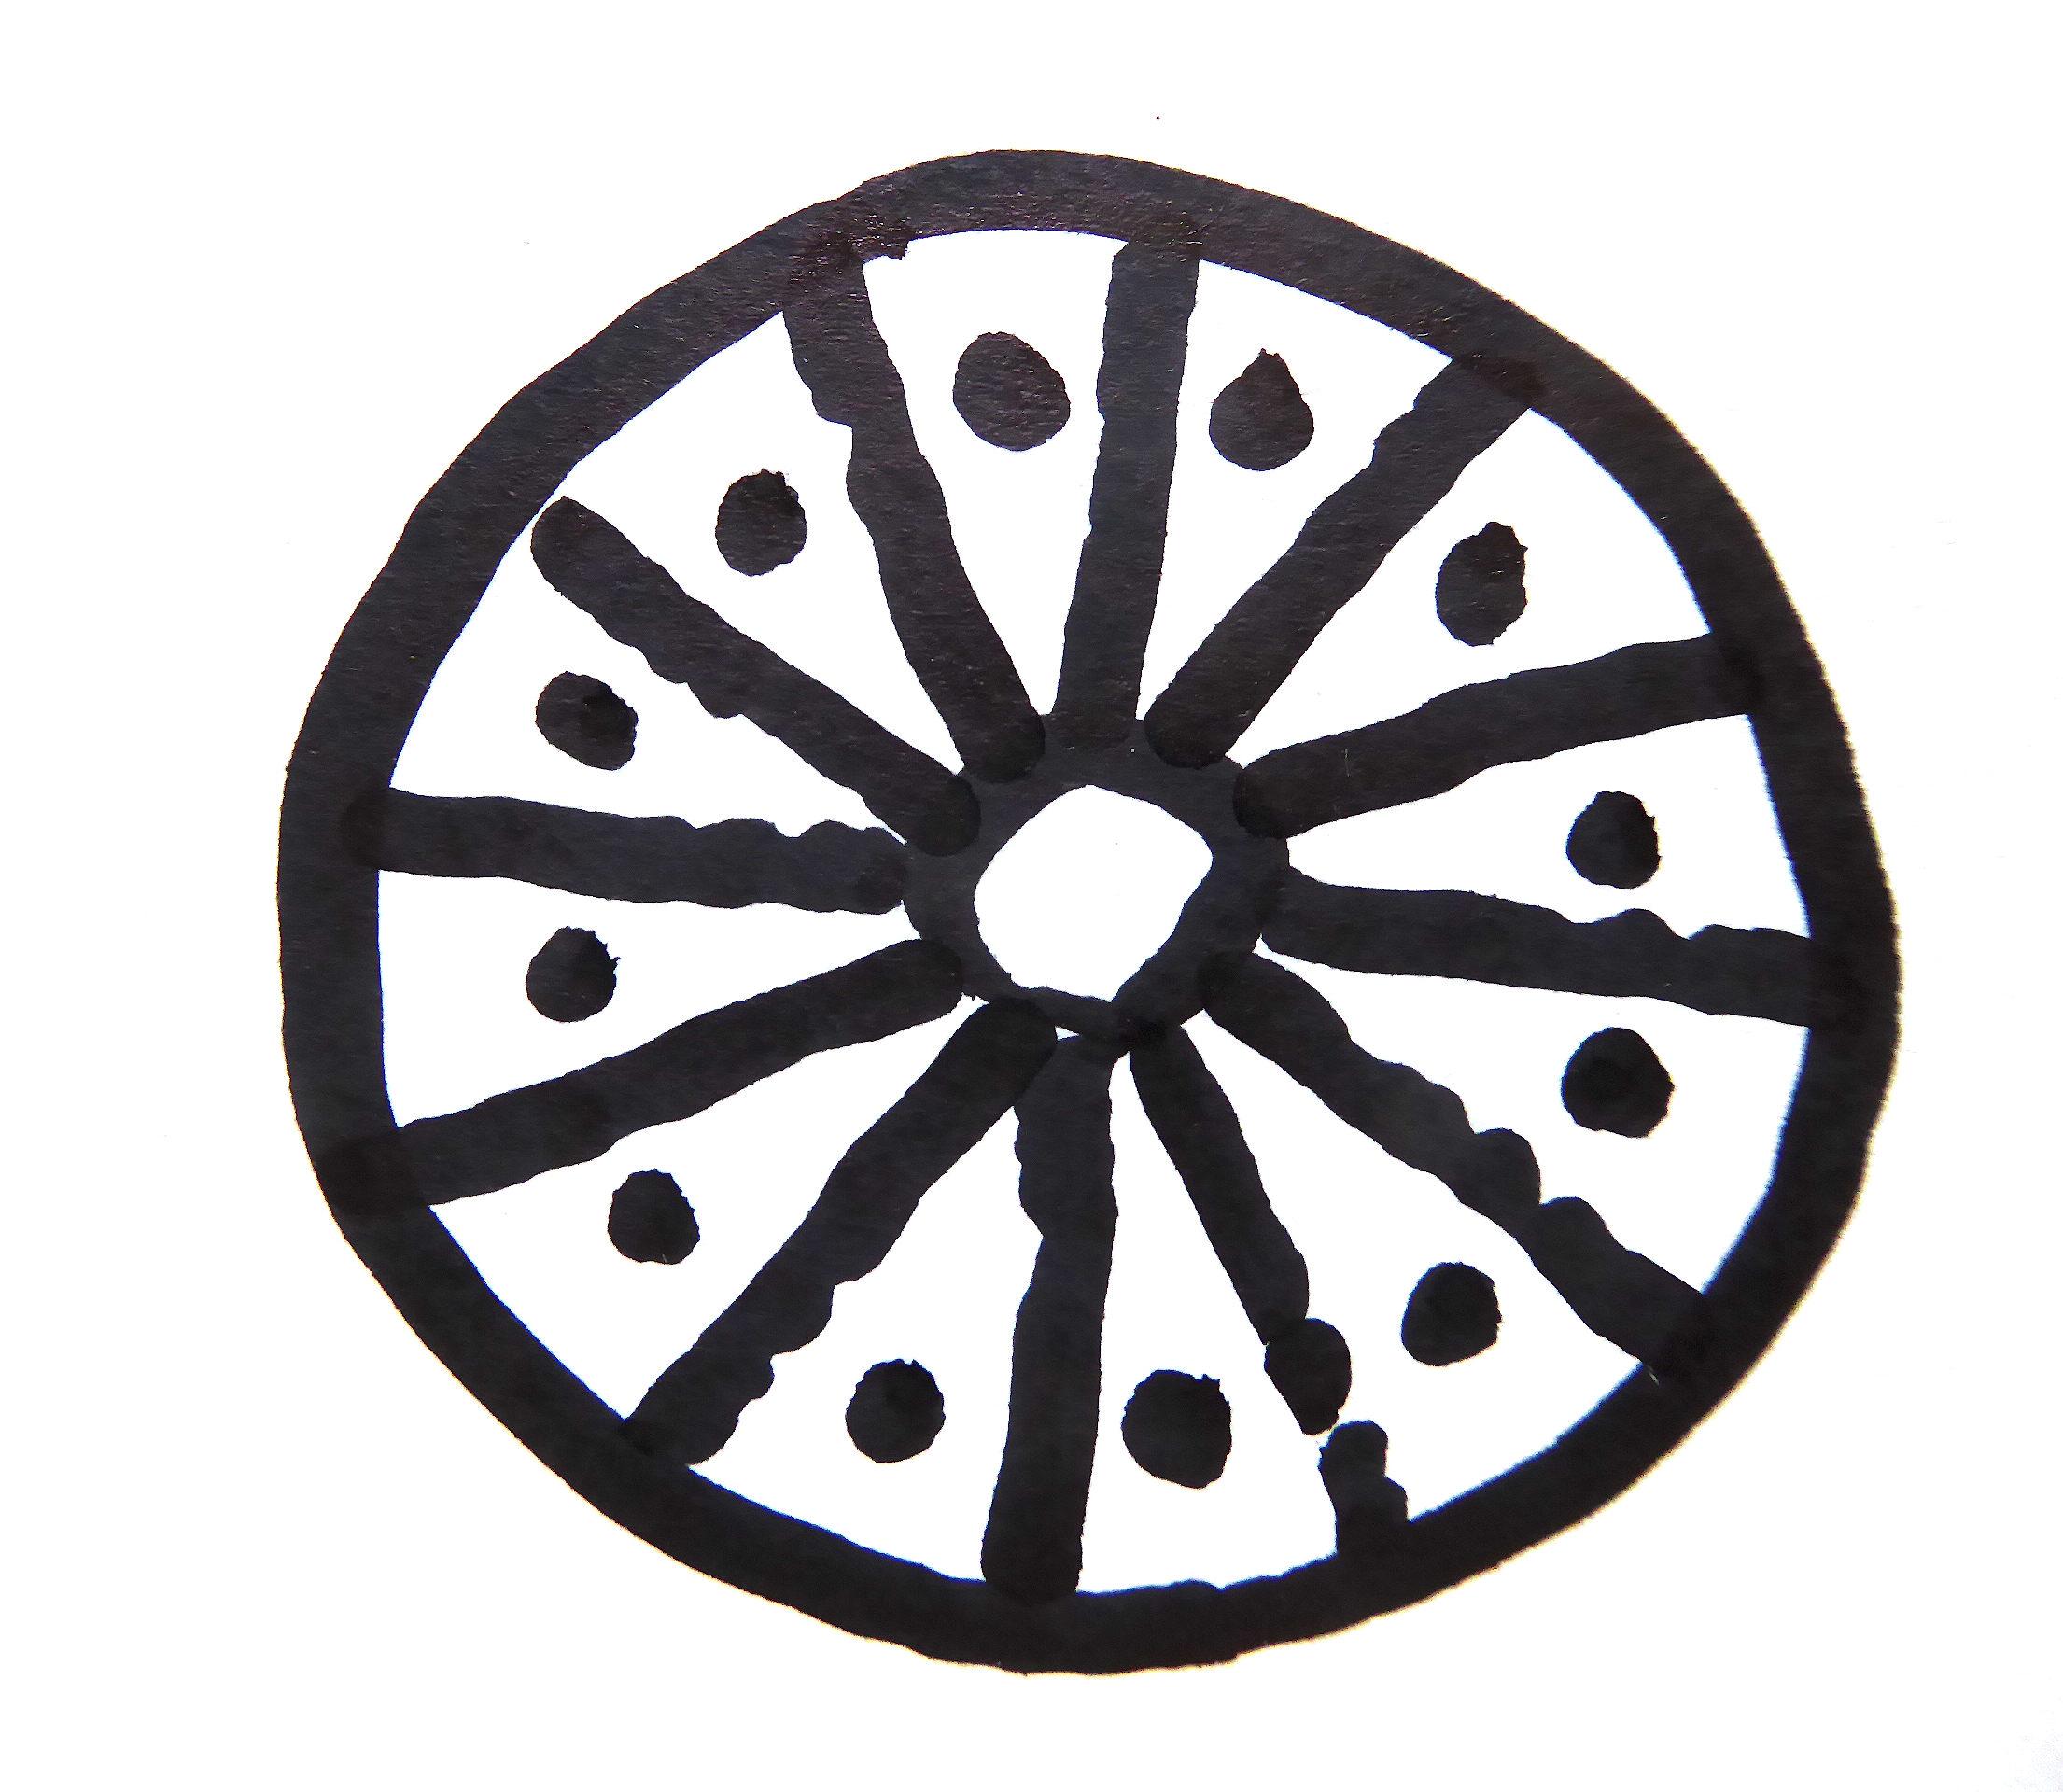 PGS 41,2 (2020) Tafel 28 Abb. 4b: Sonnenrad auch Rad des Vishnu.